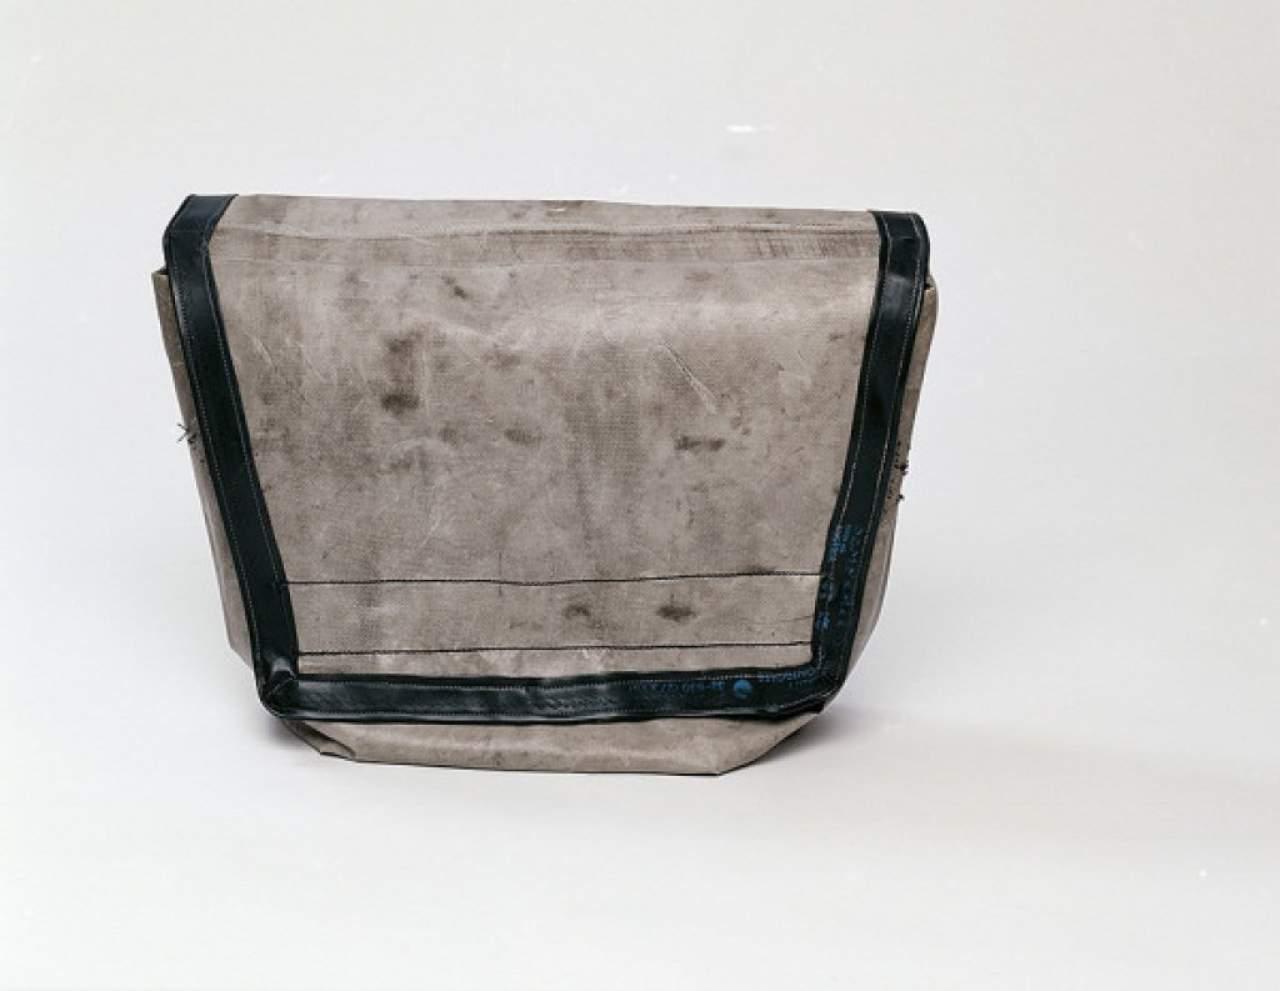 freitag tasche popul rer name daniel markus freitag daniel daniel markus freitag. Black Bedroom Furniture Sets. Home Design Ideas